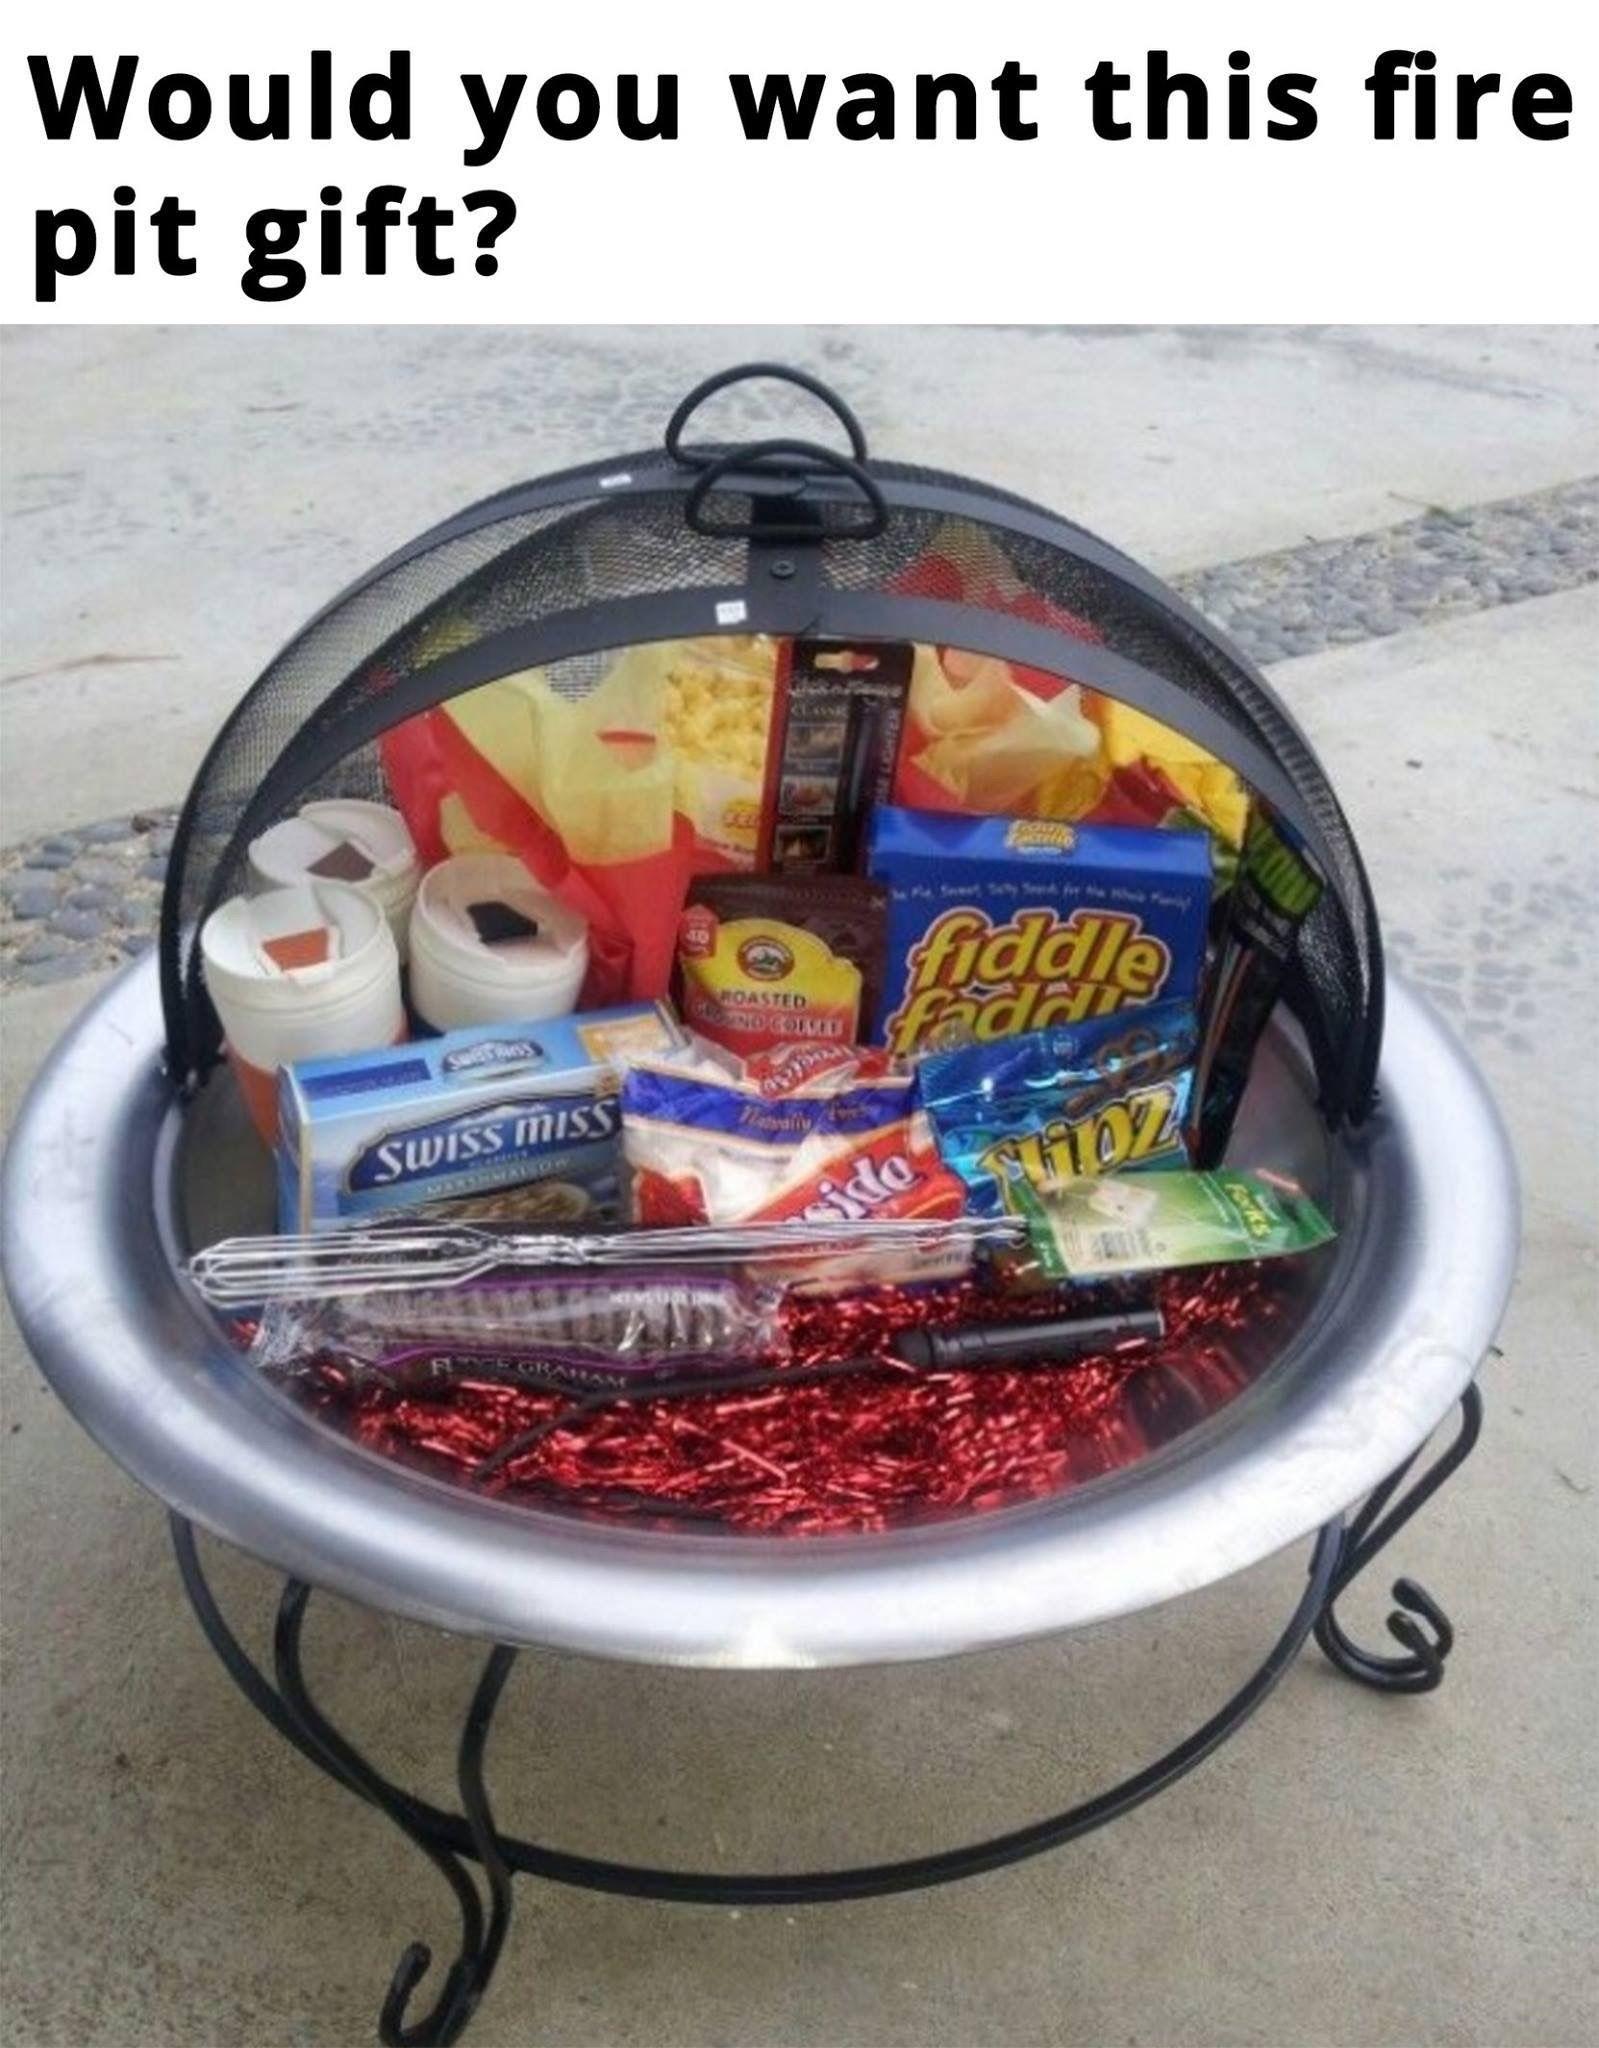 Fire pit gift idea   Gift Ideas   Pinterest   Gift